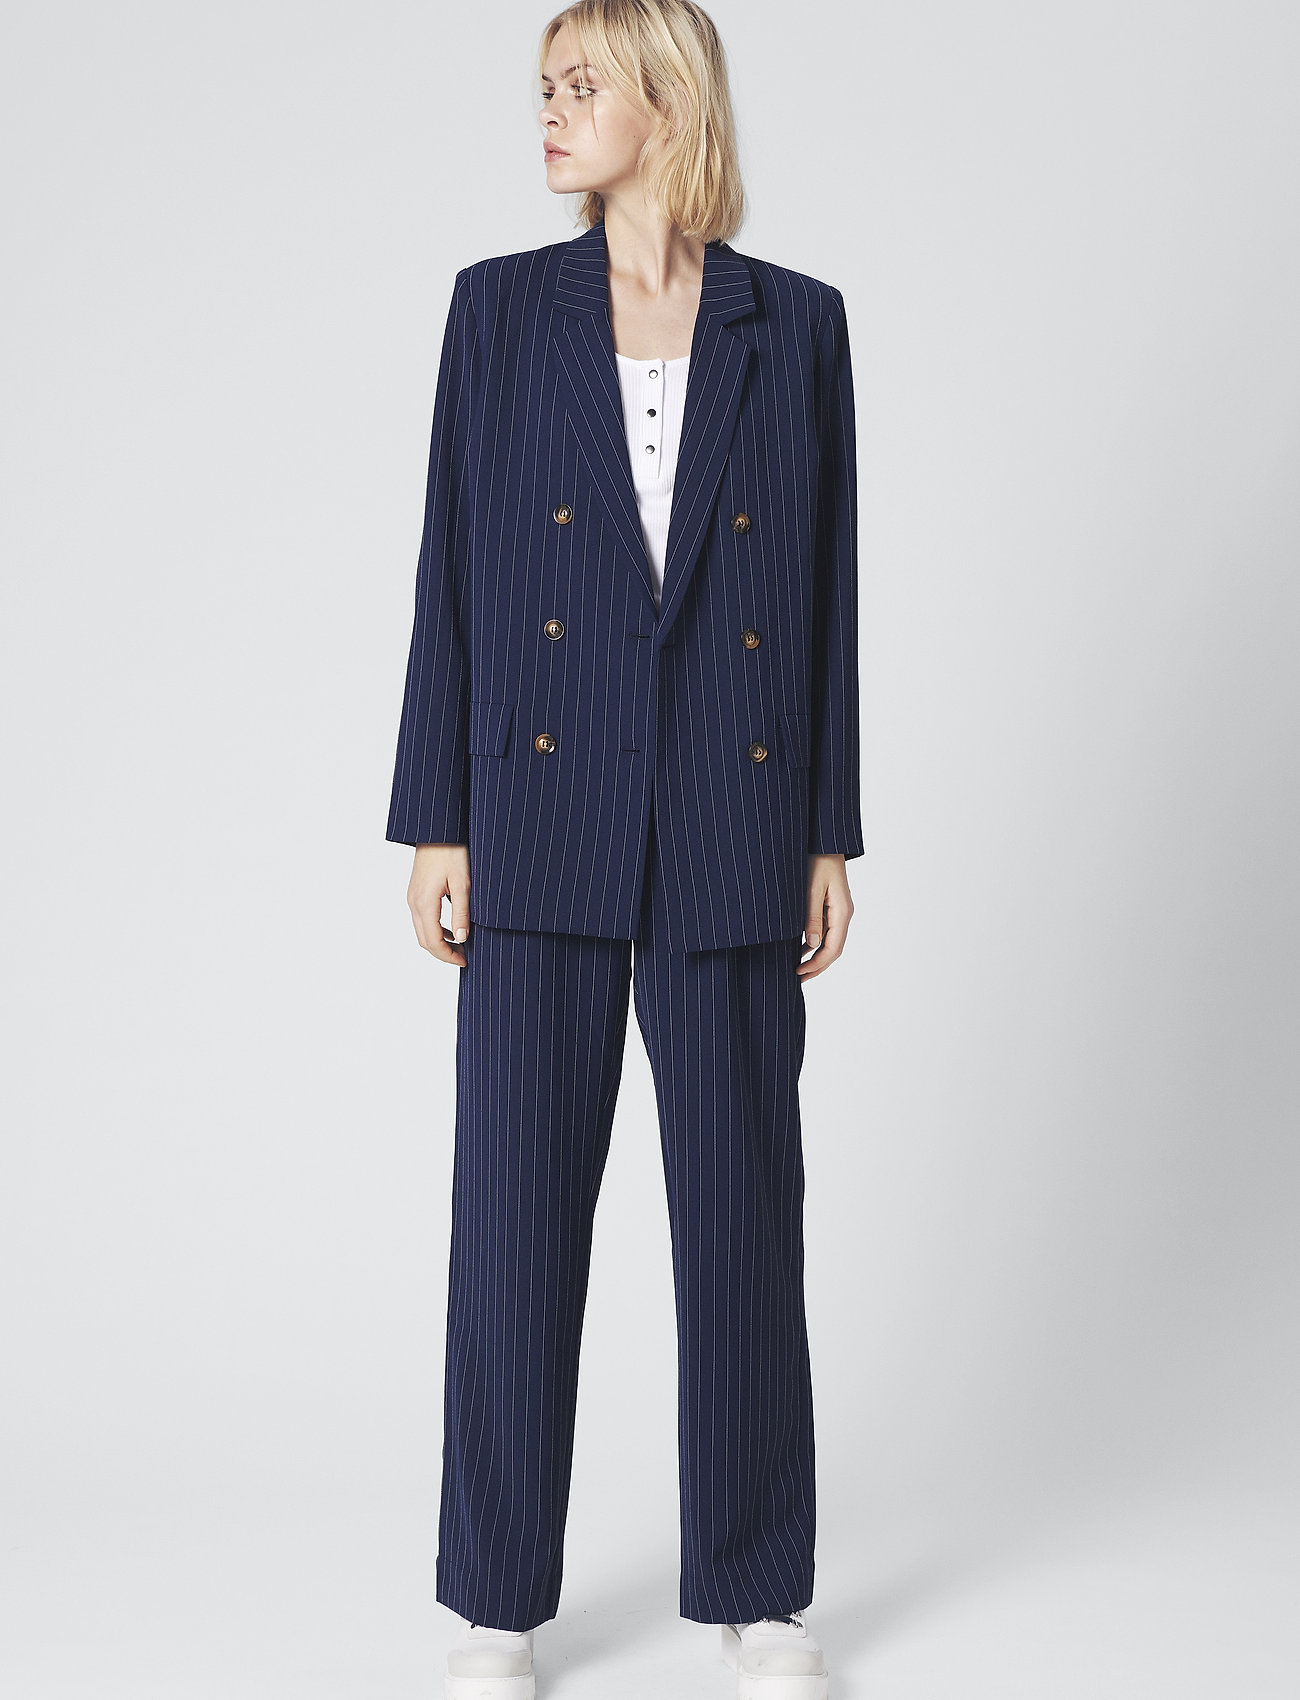 Gestuz - KineGZ pants MA19 - leveälahkeiset housut - peacoat pinstripe